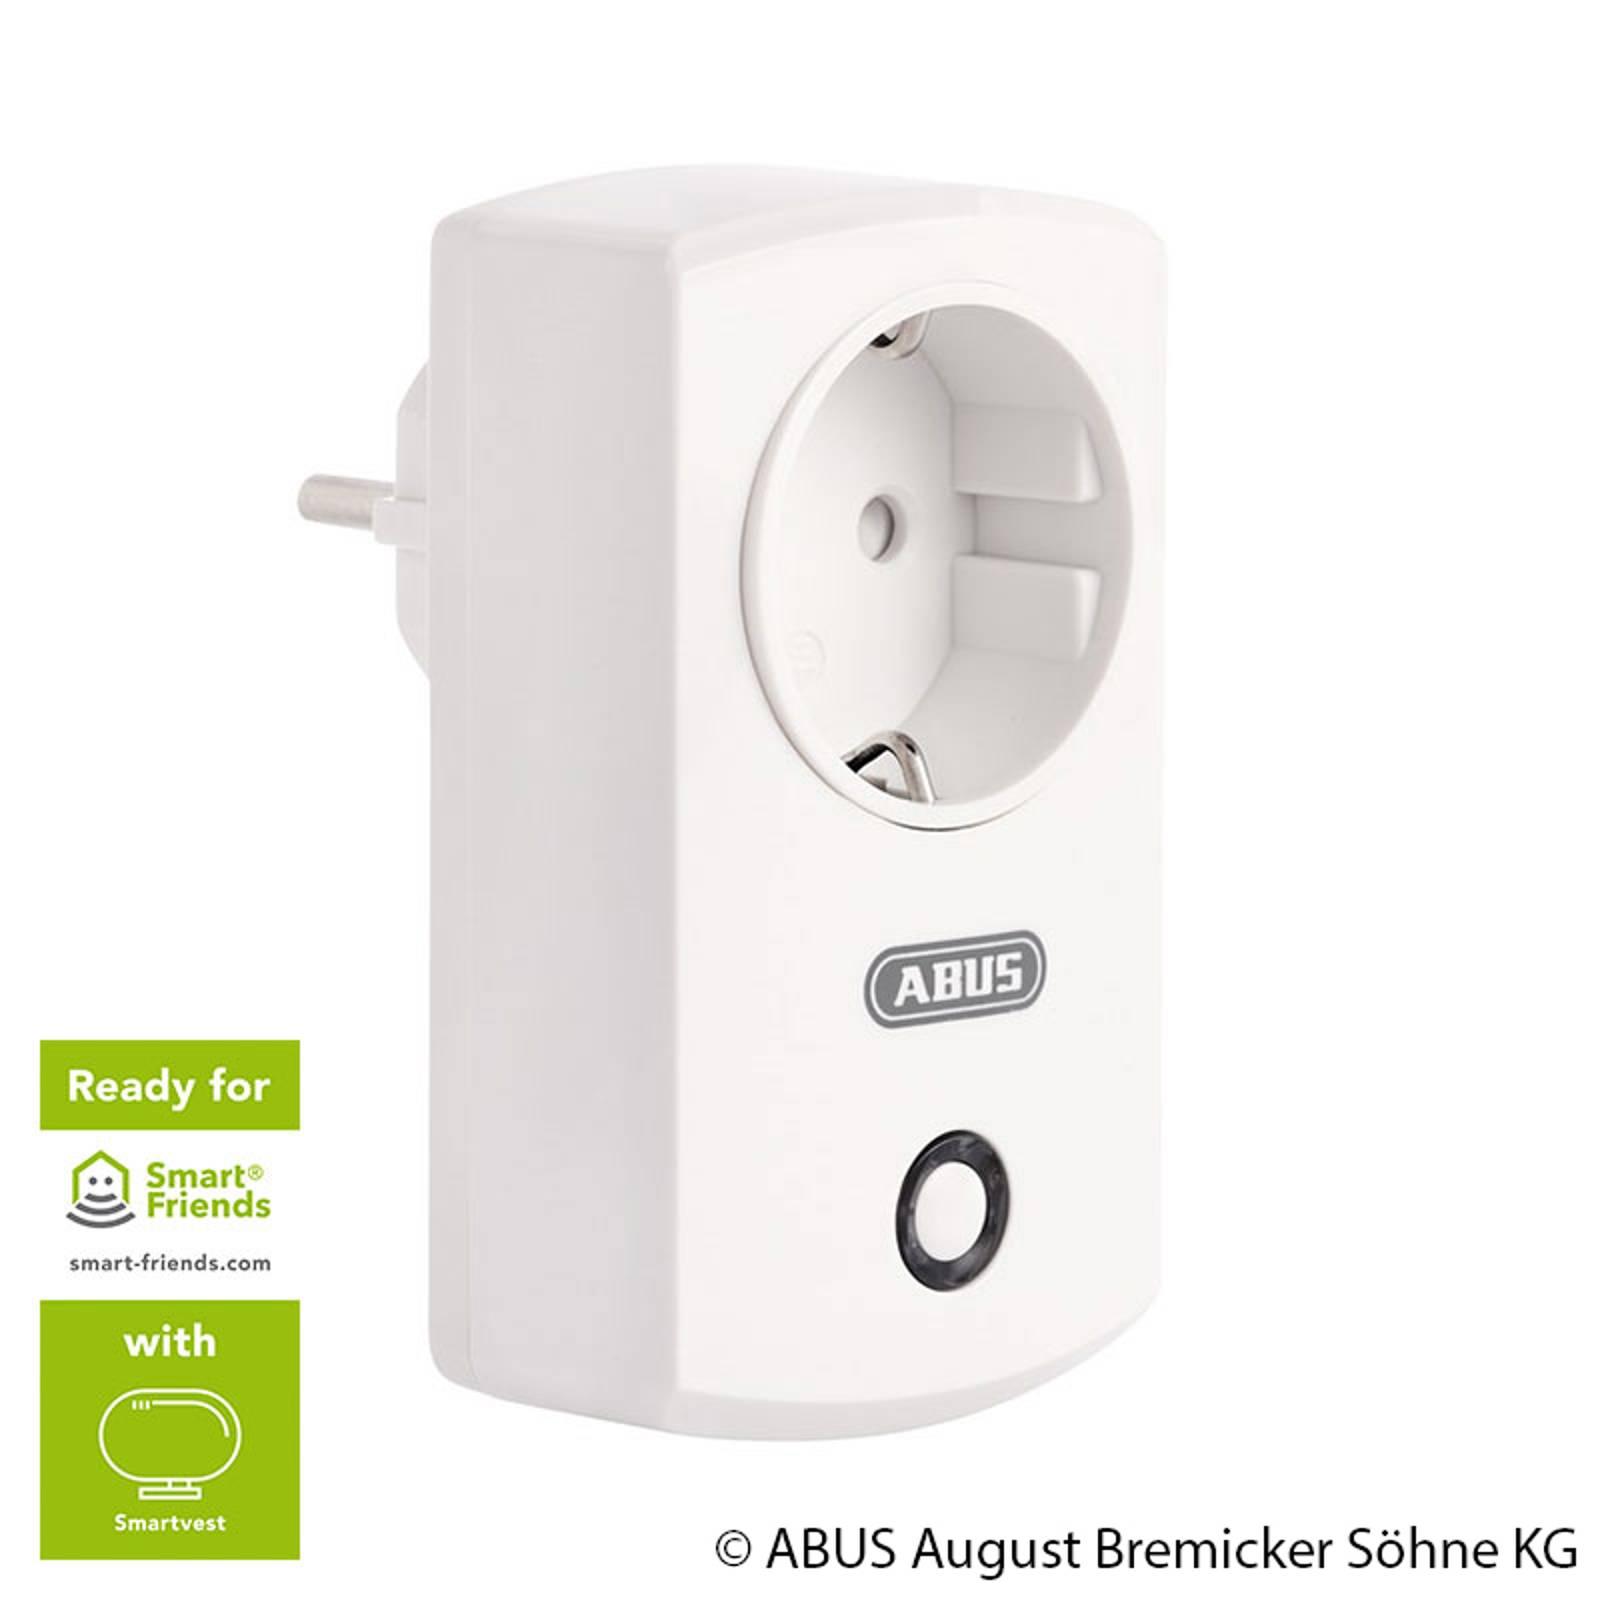 ABUS Smartvest trådlöst eluttag